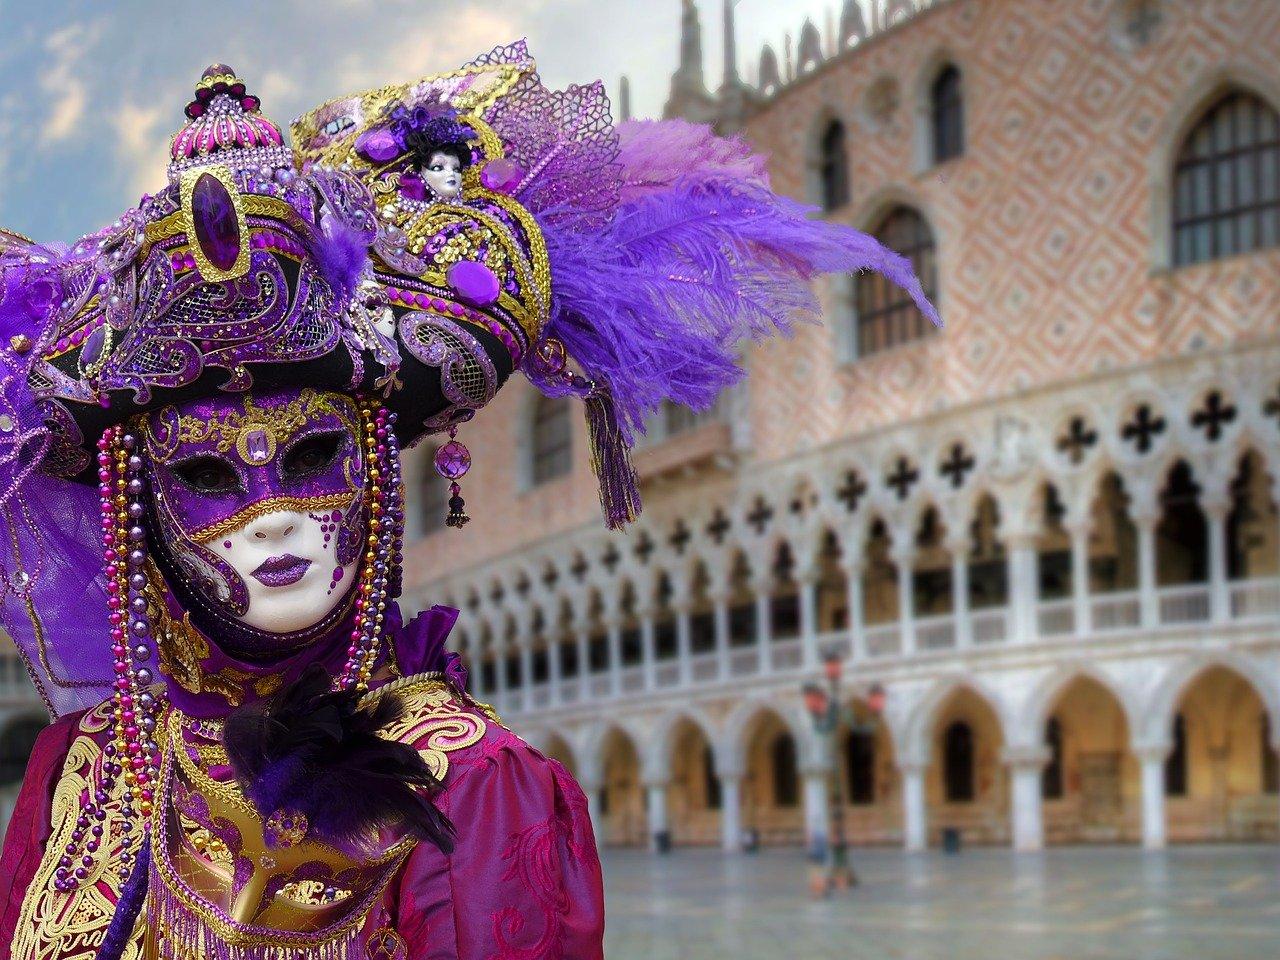 Carnevale 2021 Venezia si farà